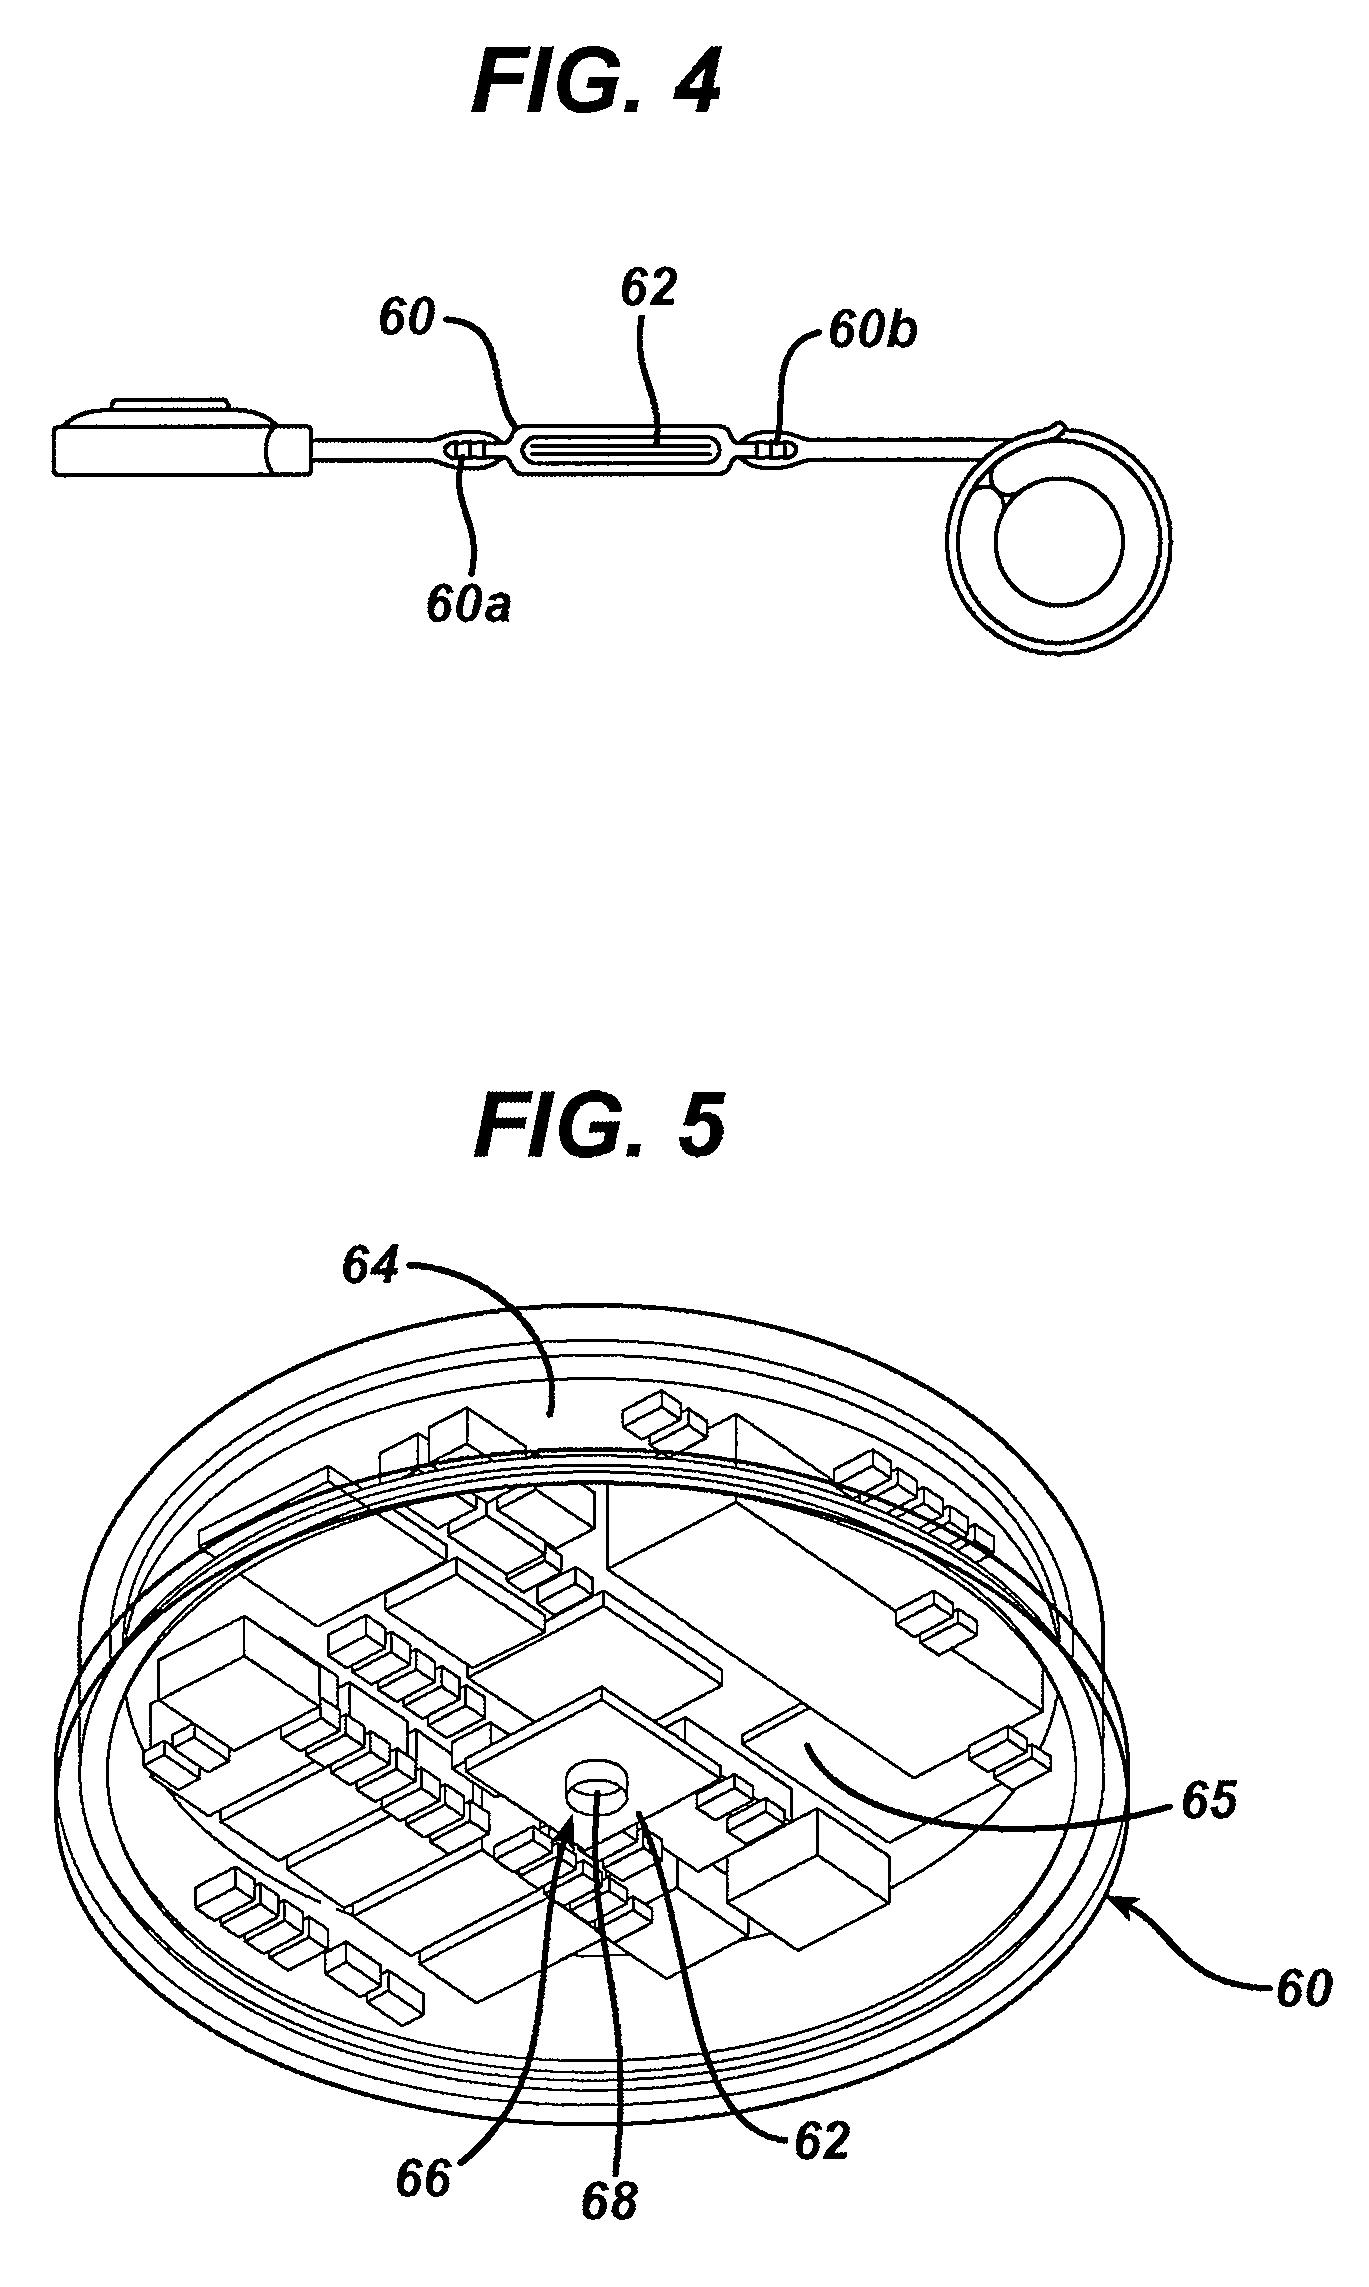 Patent US 8,591,395 B2